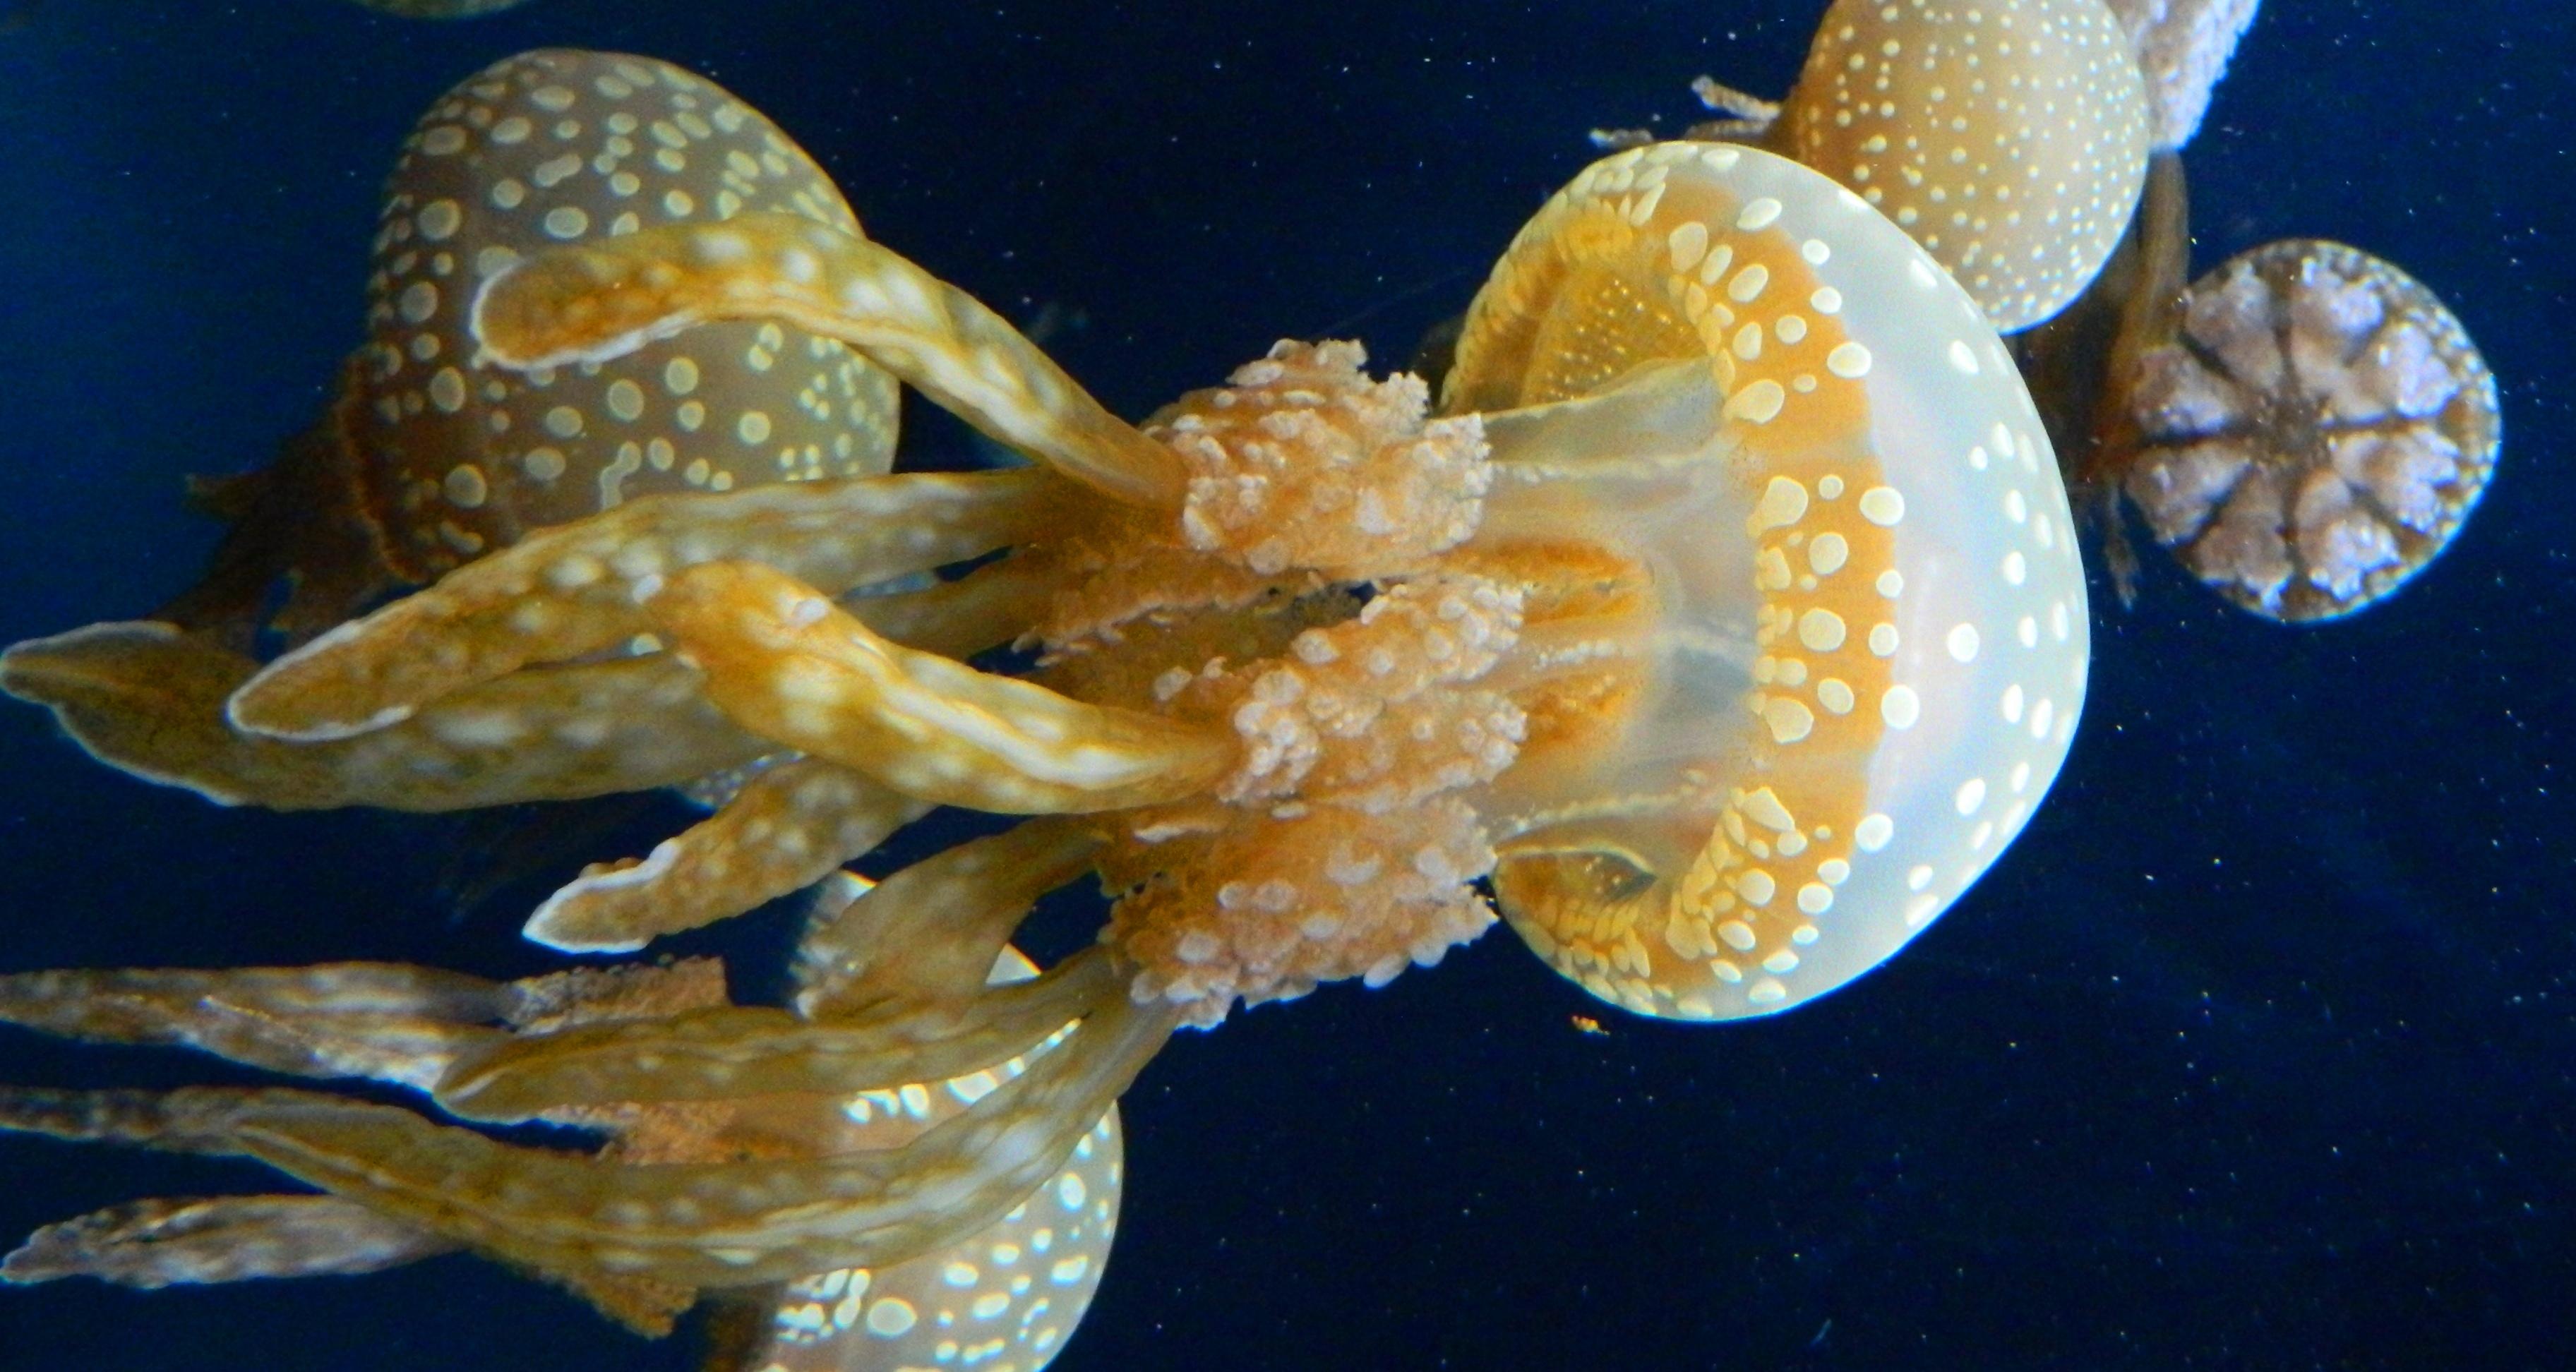 Common parasites of california marine fishes.